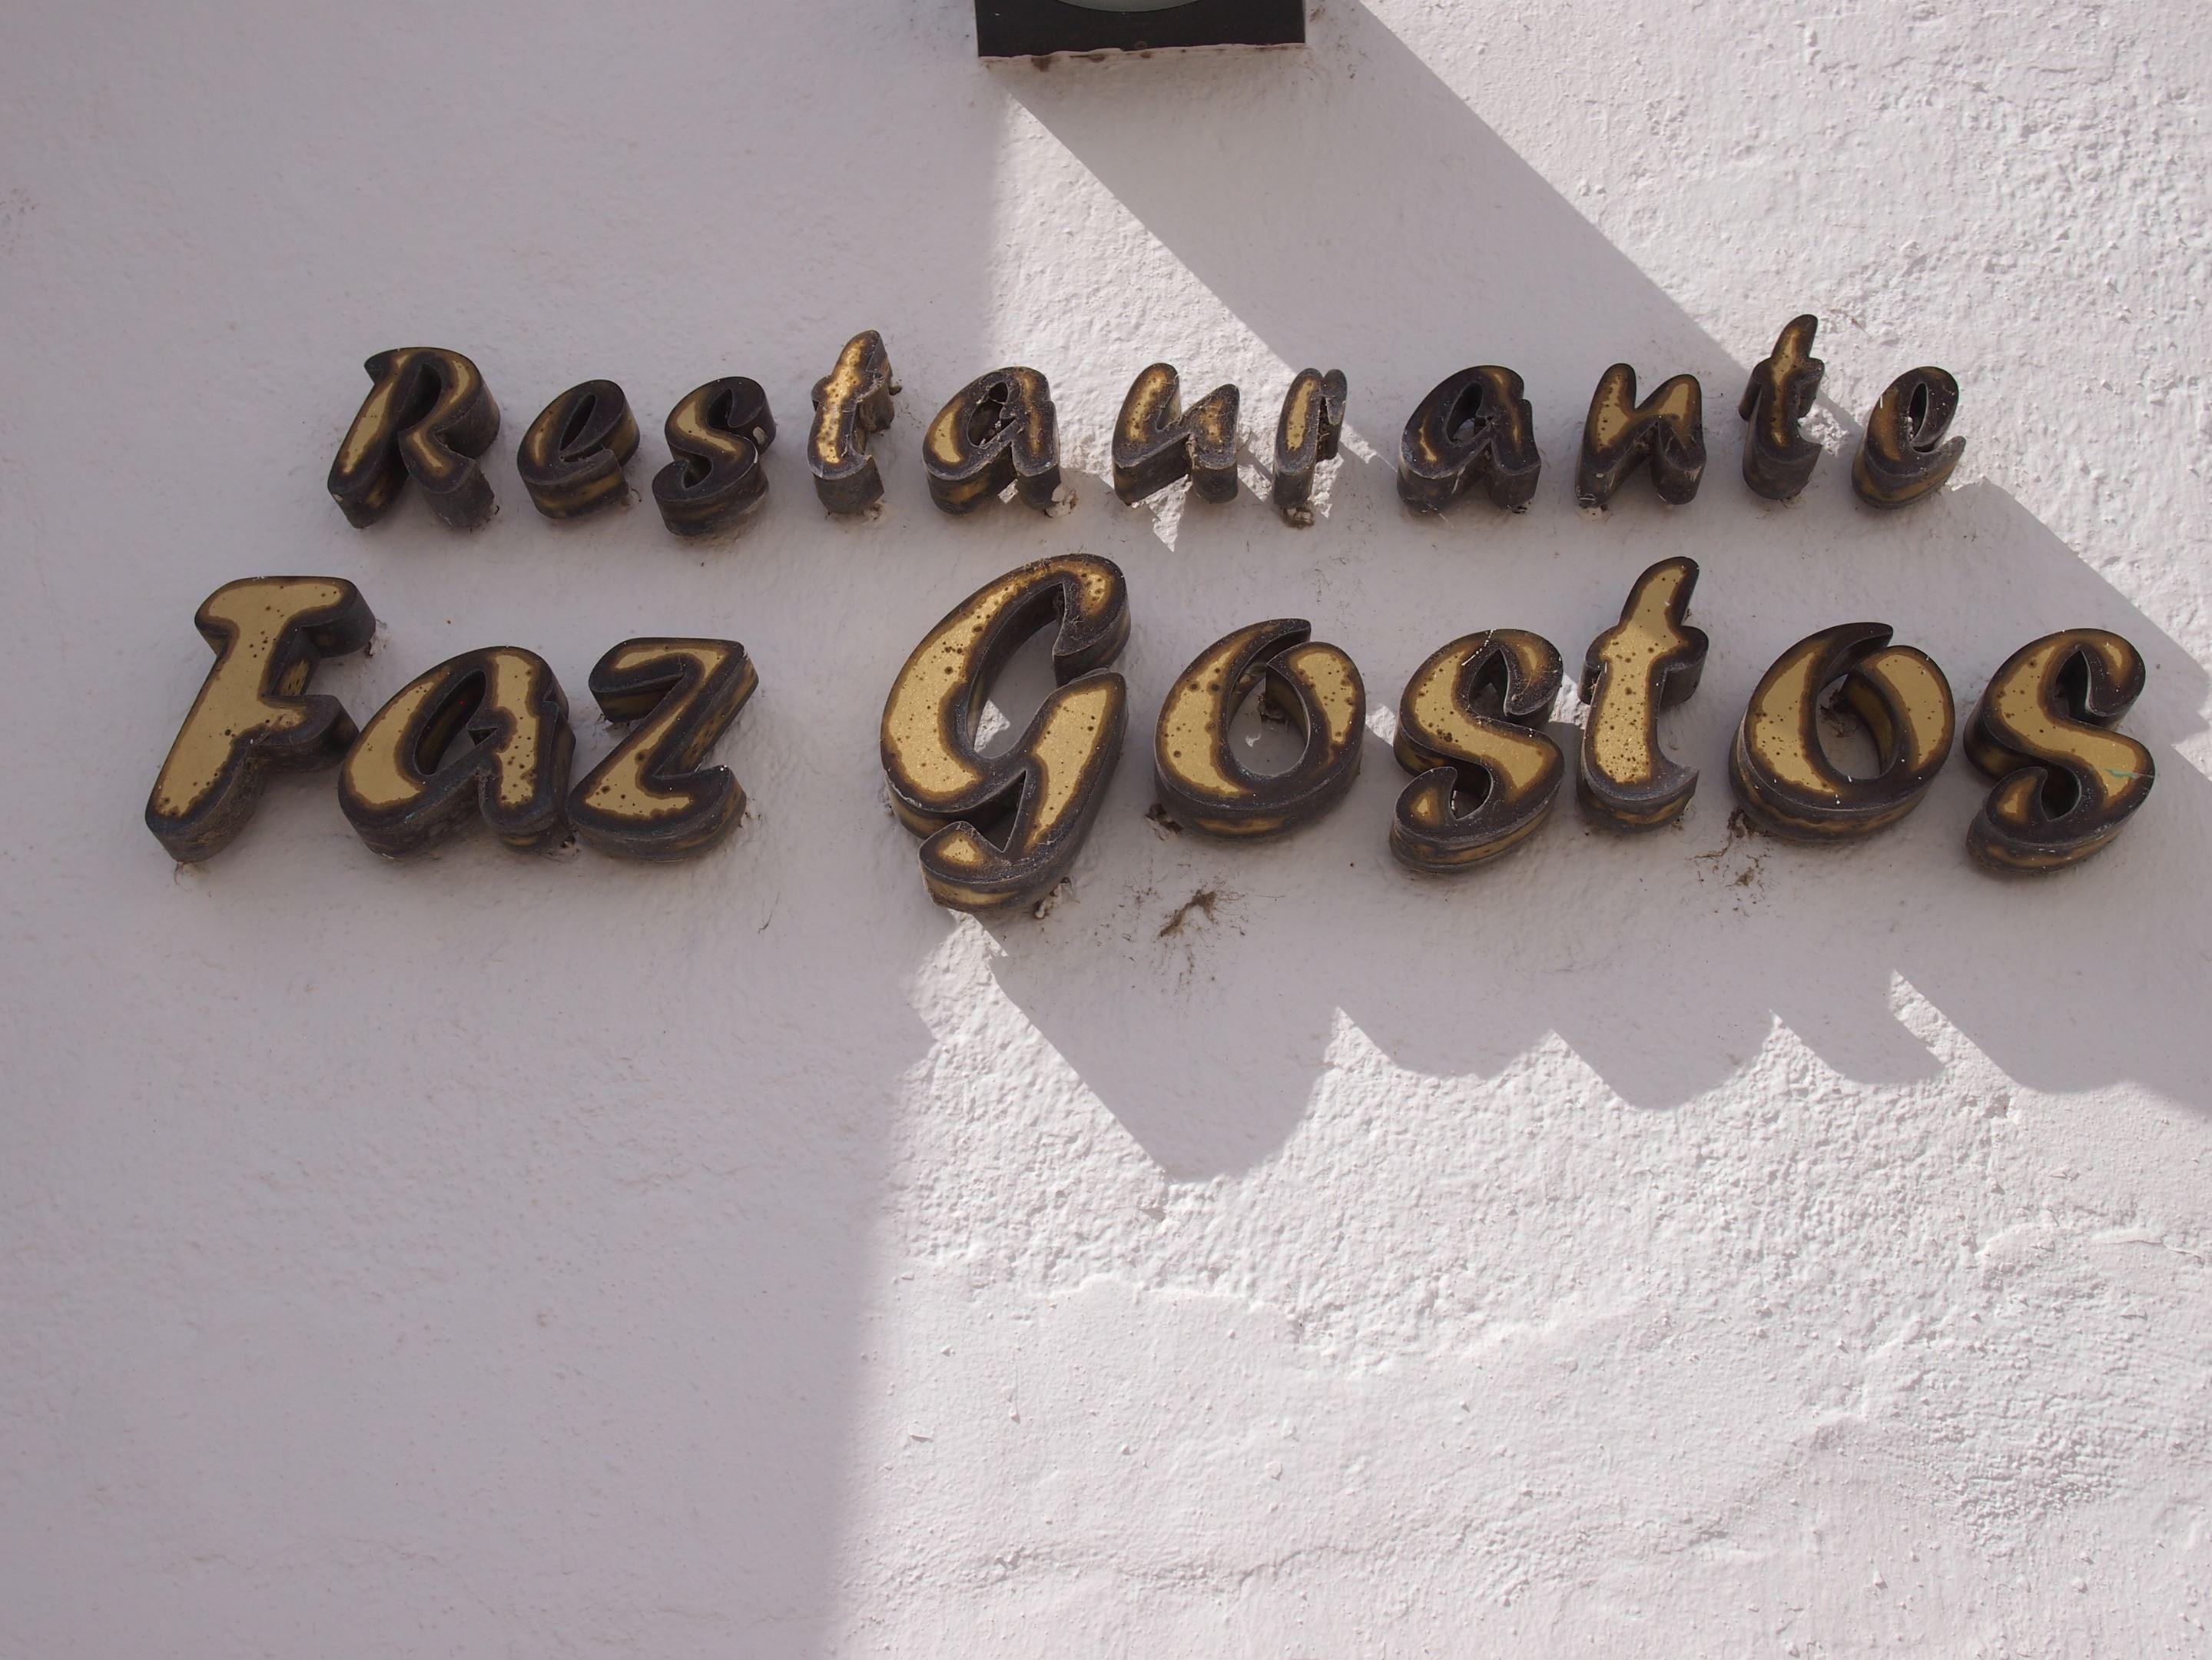 Faz Gostos restaurant, Faro